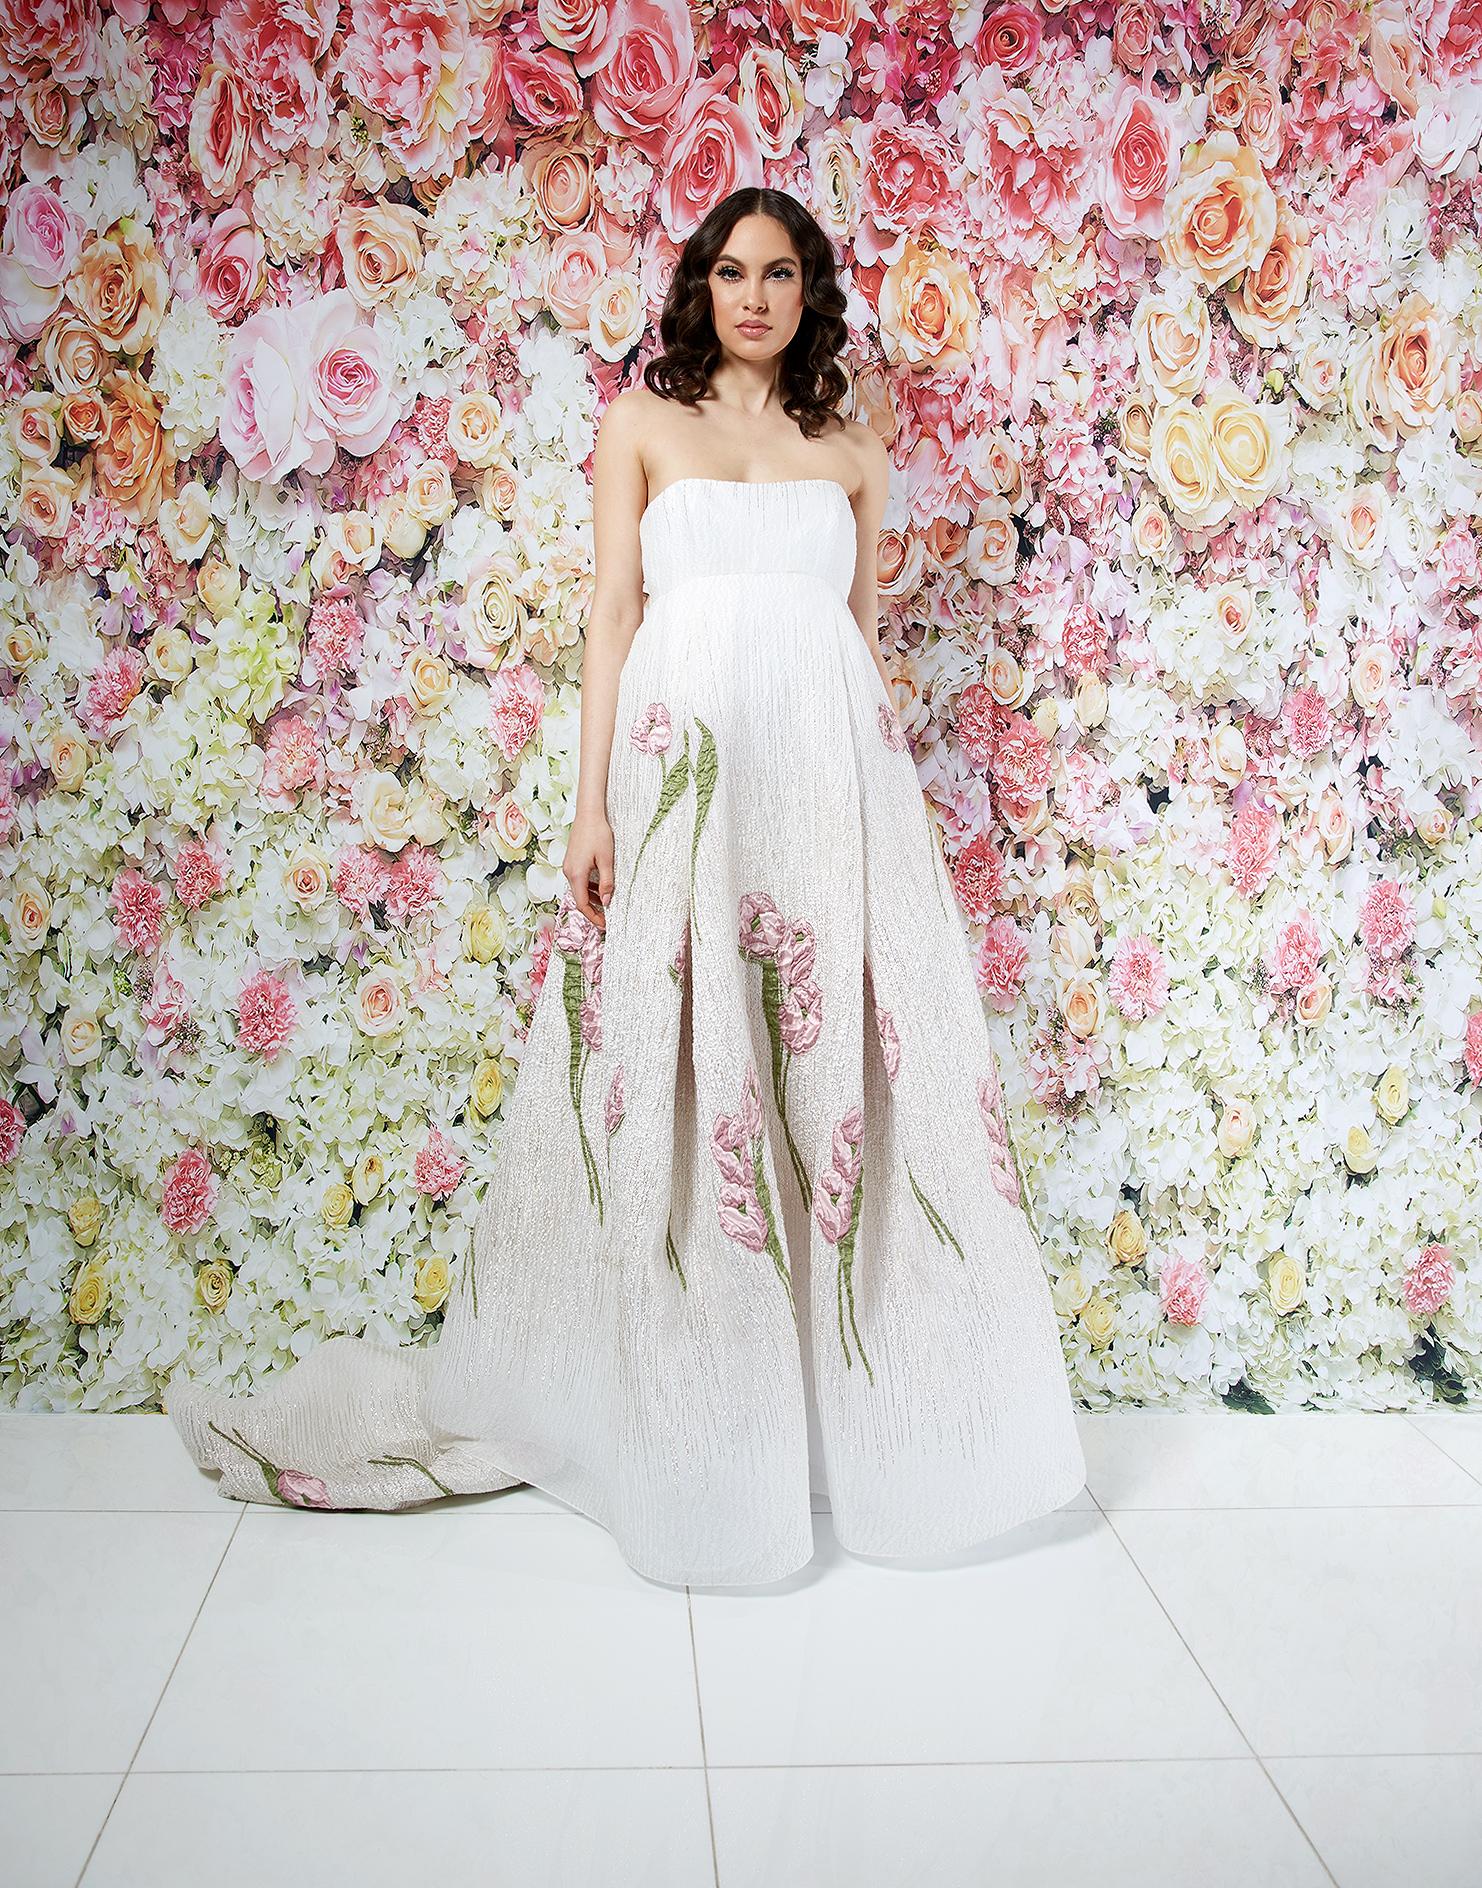 randi rahm wedding dress spring 2019 strapless a-line applique florals